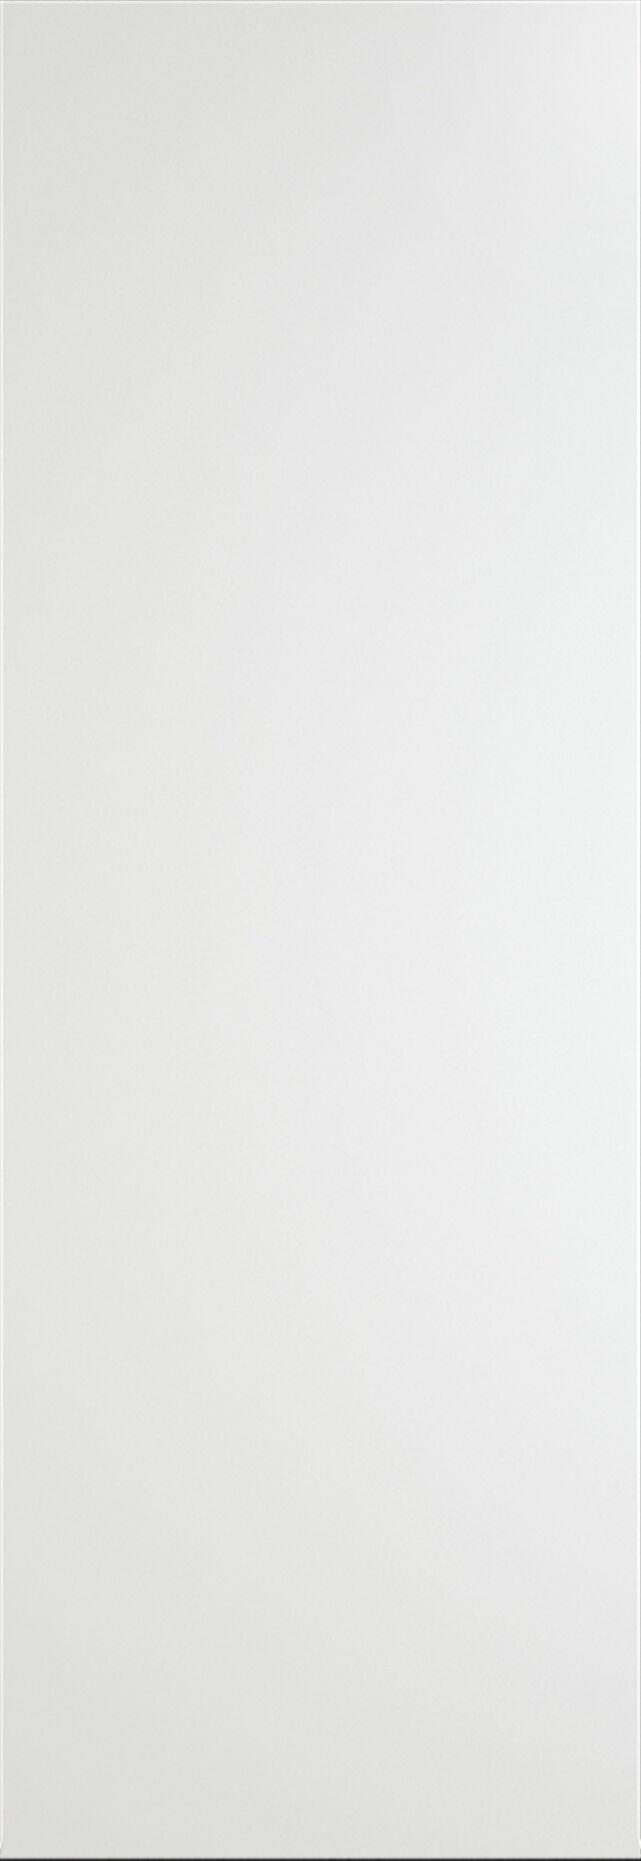 Tivoli А-1 Invisible цвет - Белая эмаль Без стекла (ДГ)